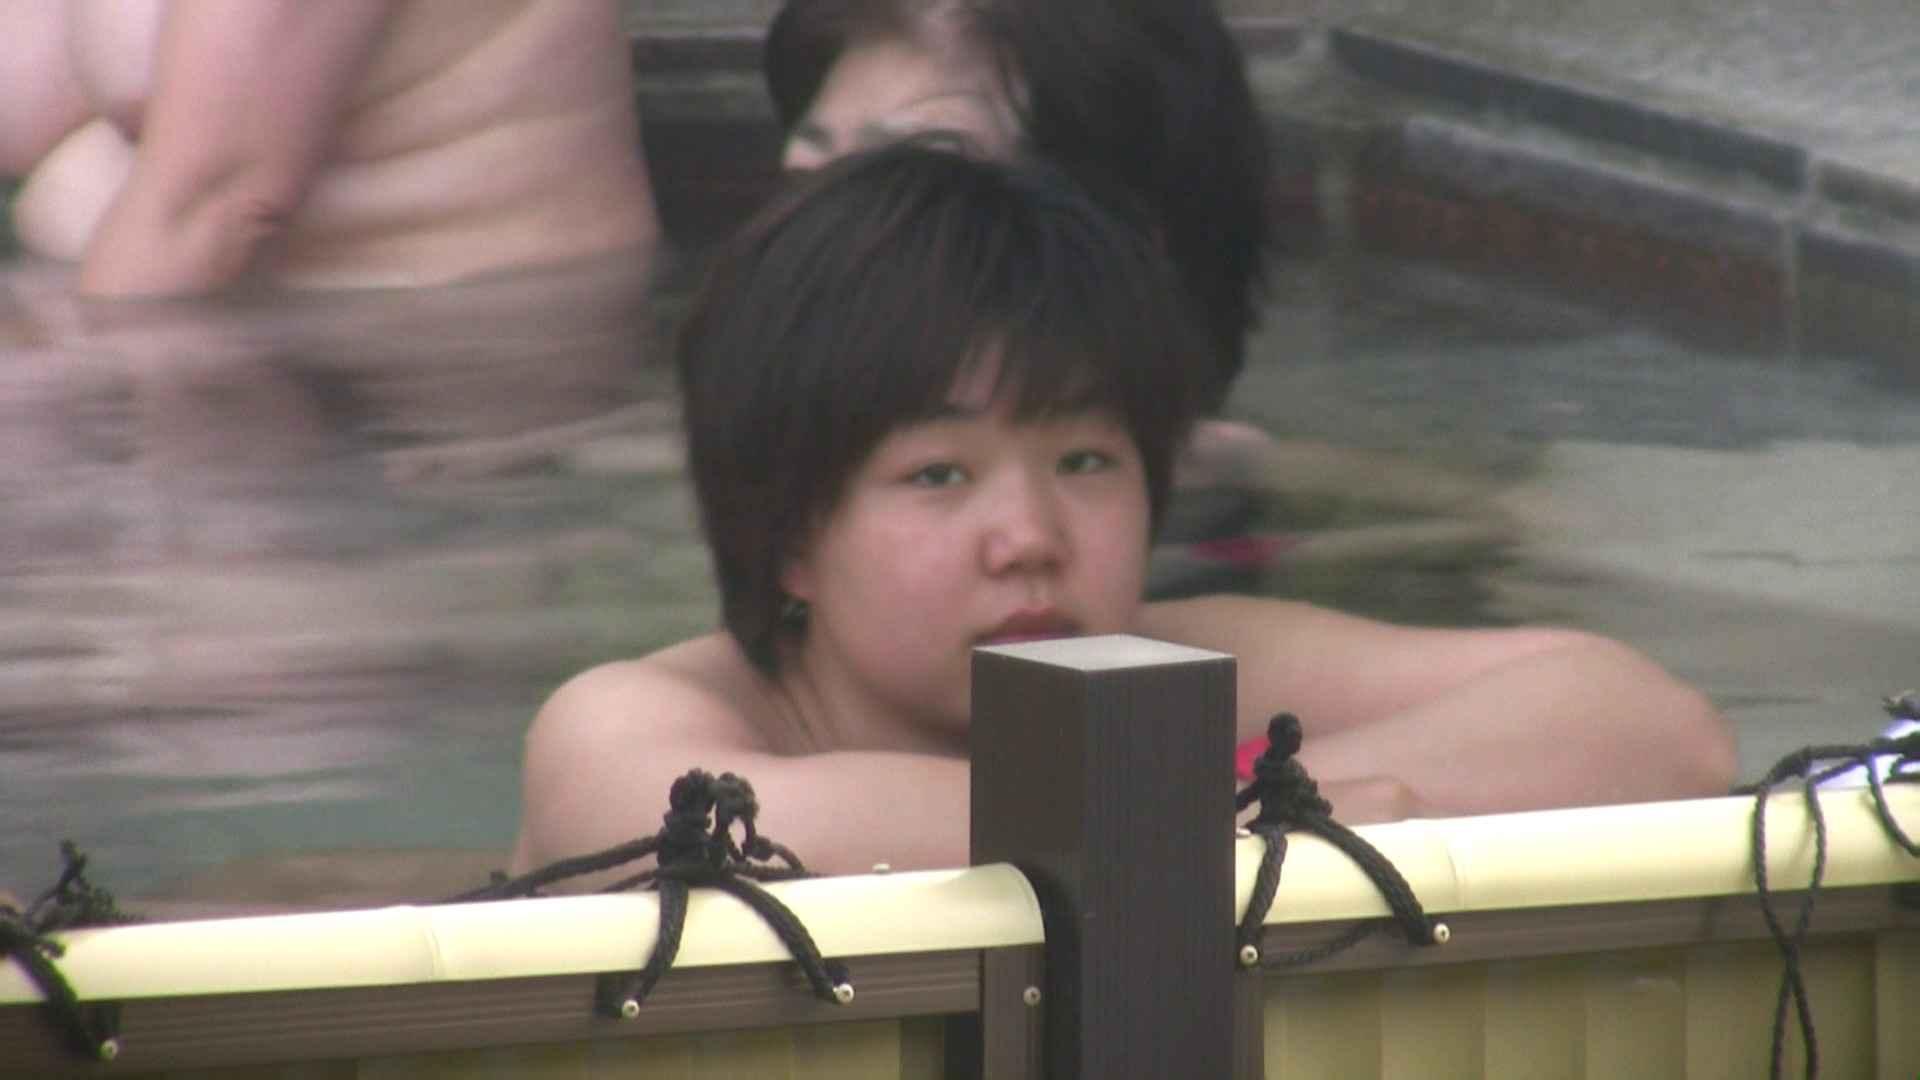 Aquaな露天風呂Vol.53【VIP限定】 OLエロ画像 盗撮おめこ無修正動画無料 54PICs 32